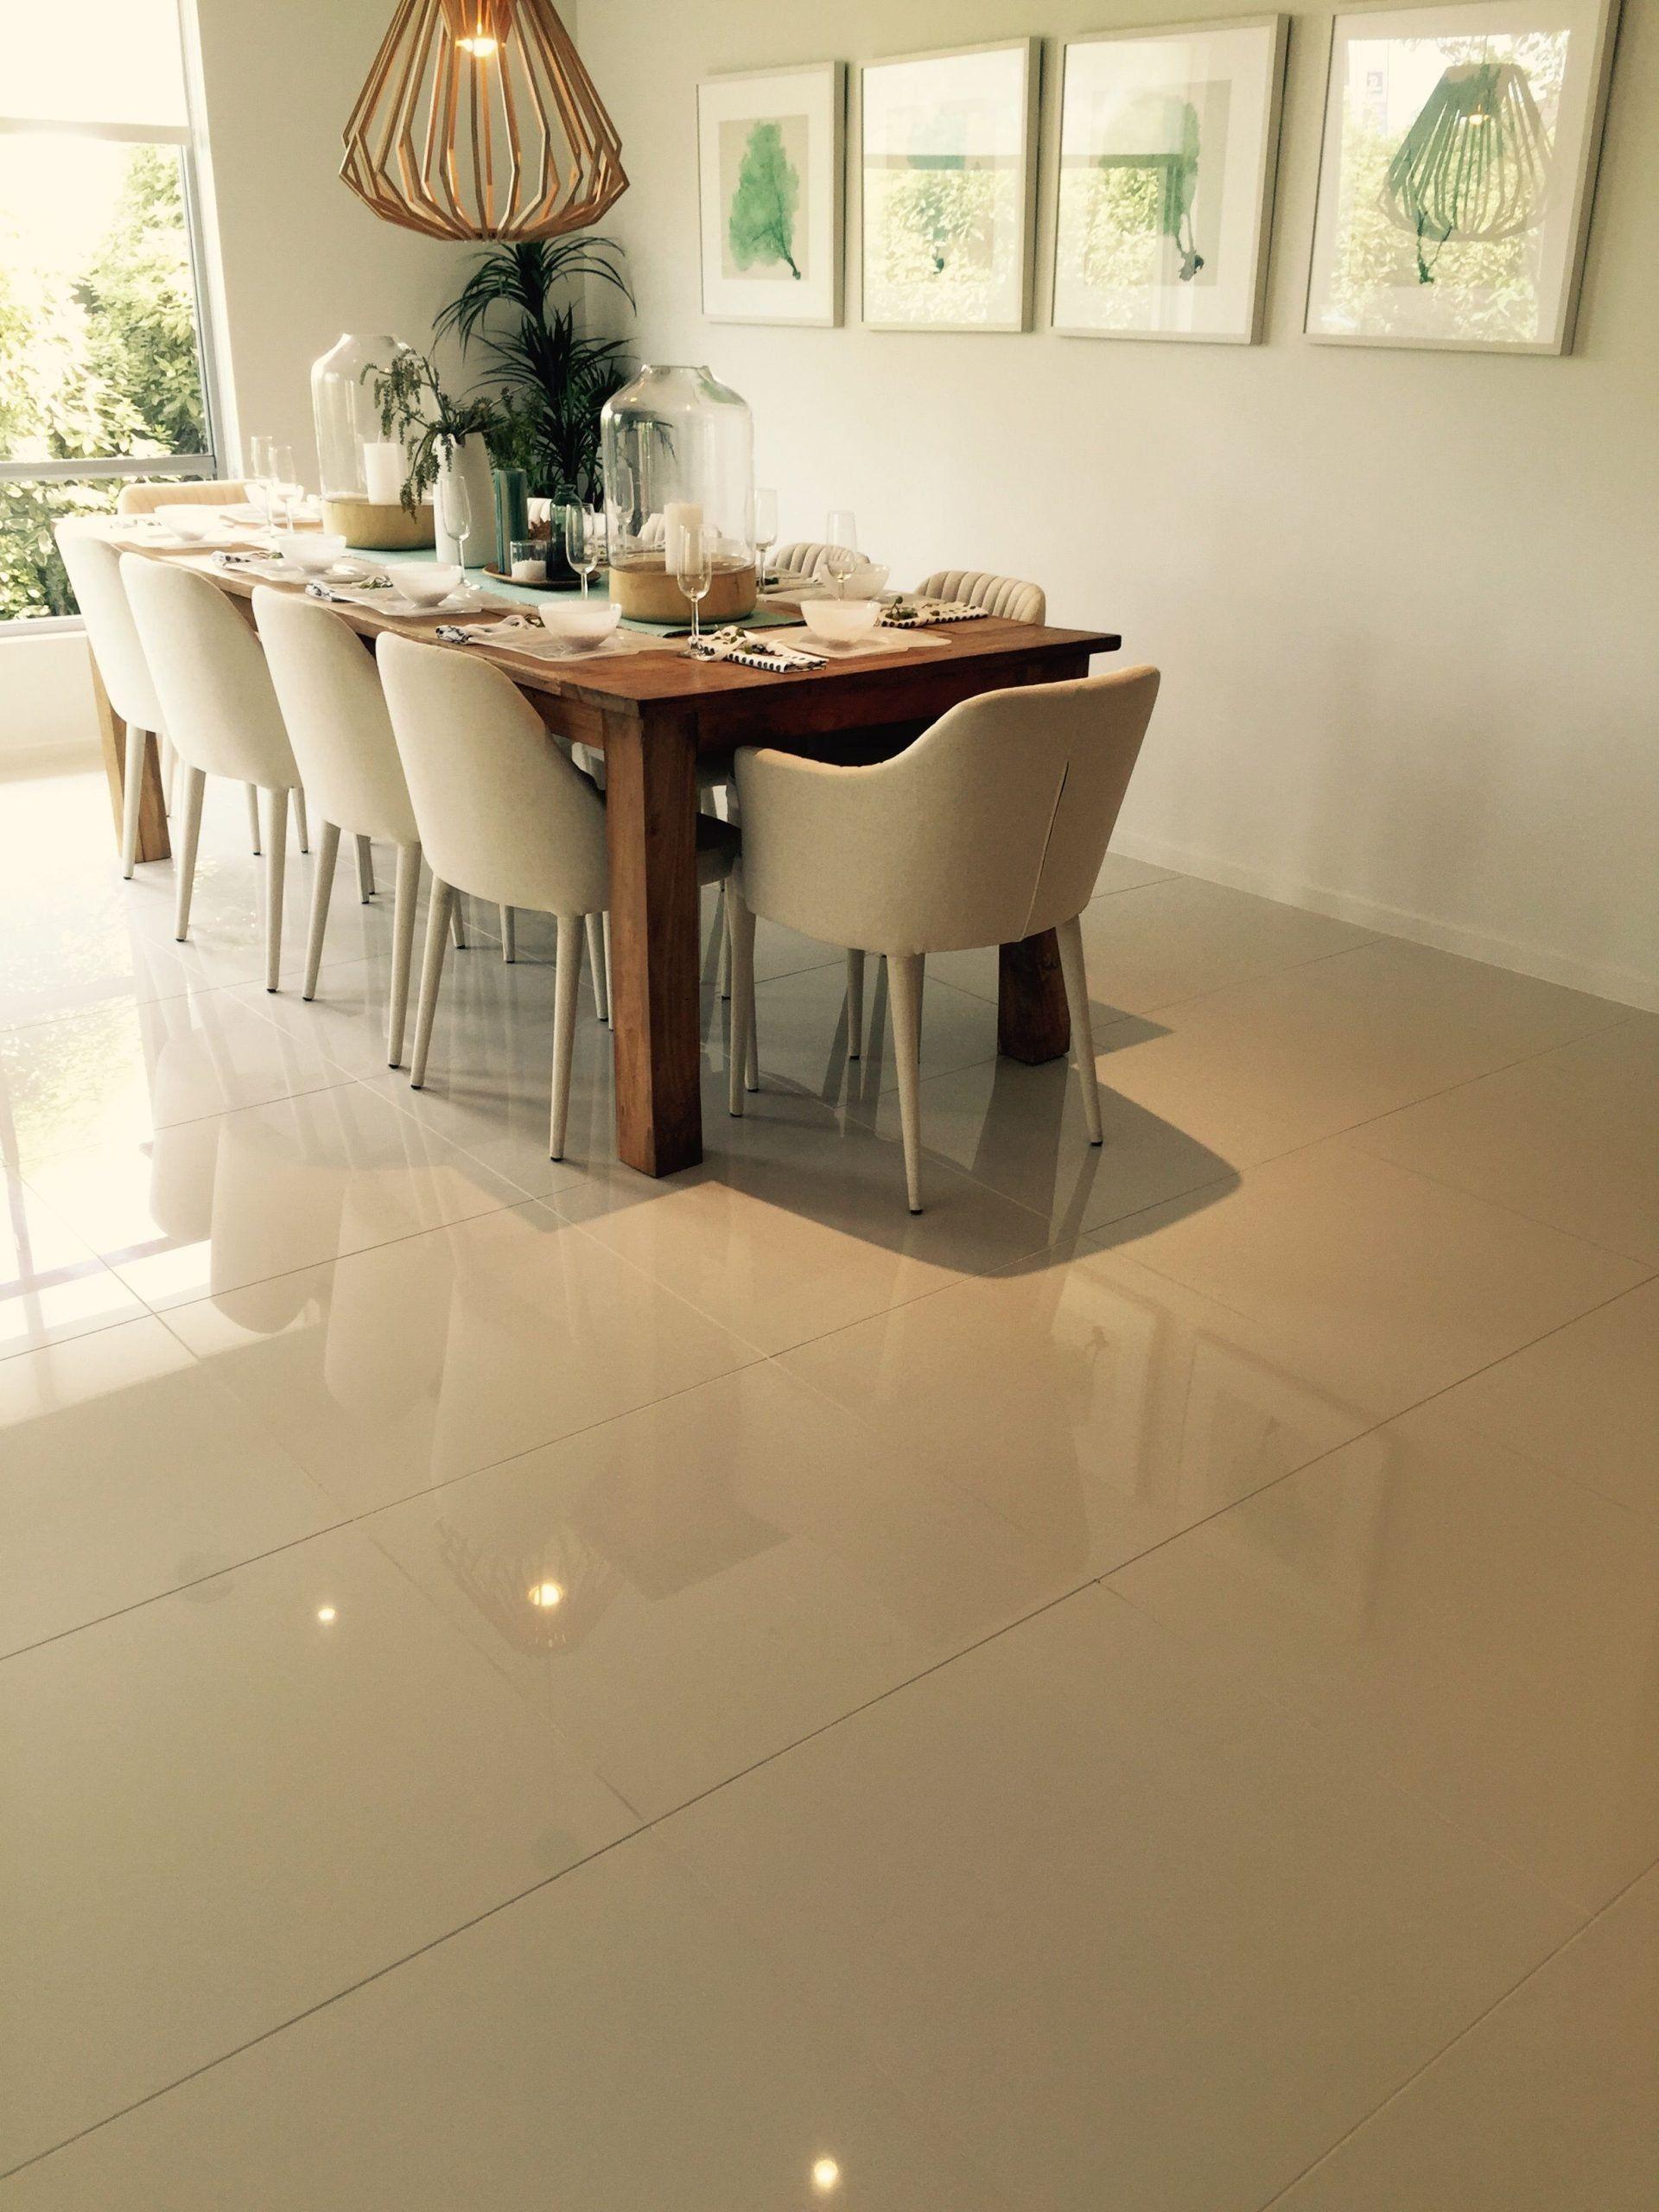 Kitchen And Dining Room Floor Polished Porcelain Tiles For Flooring Picture 5 Tile Floor Living Room Dining Room Floor Kitchen Flooring